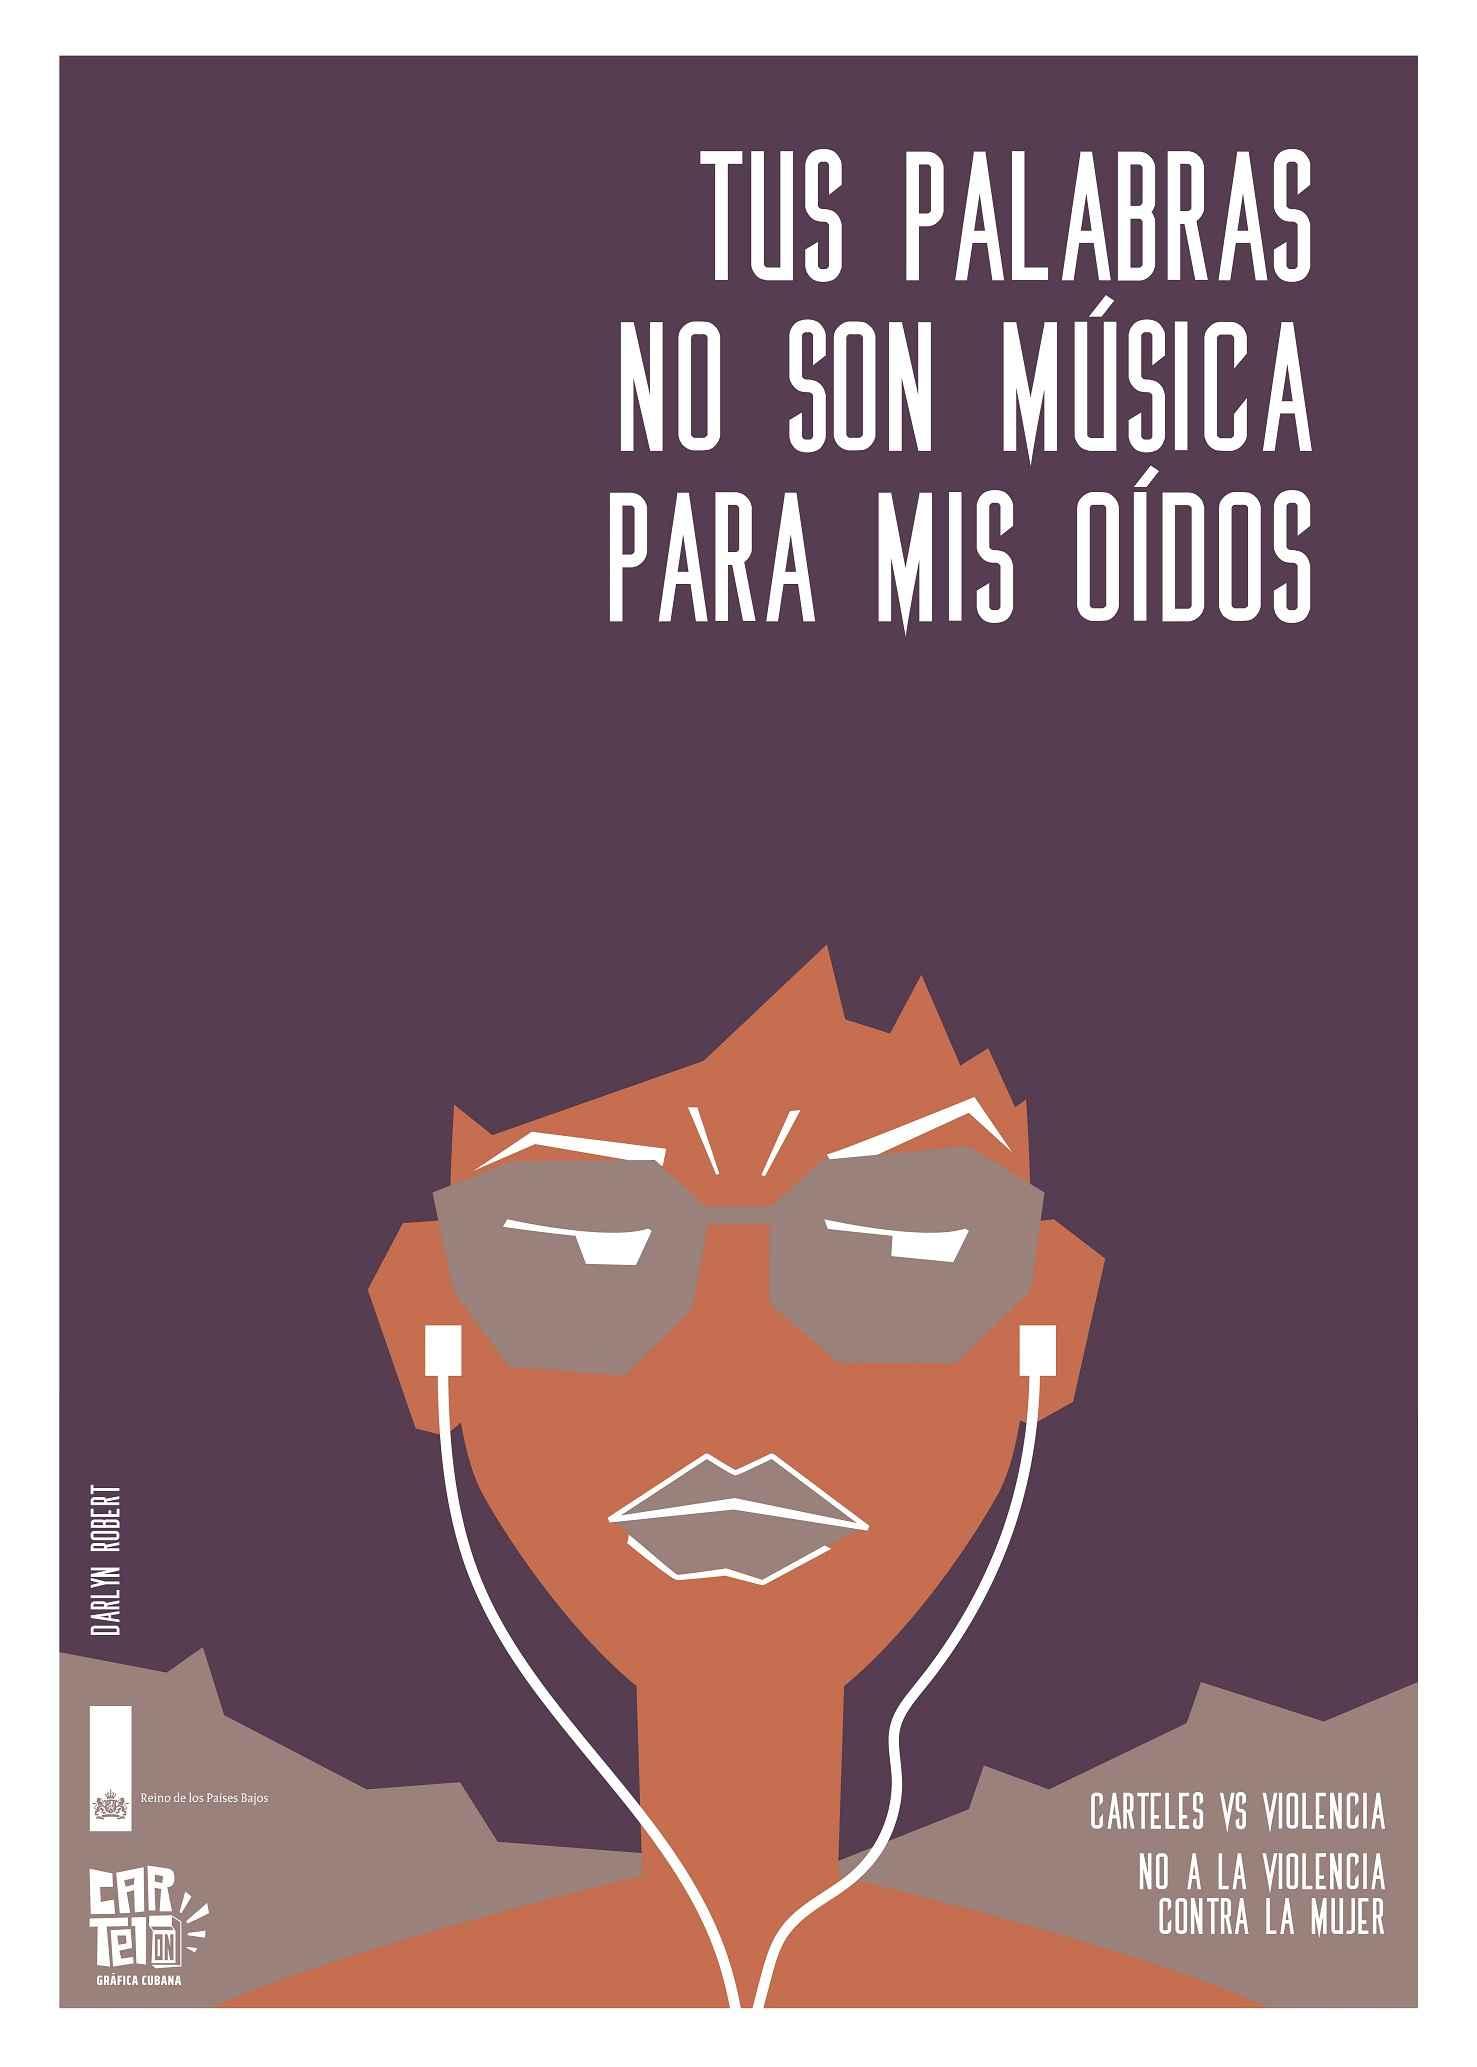 Obra: Tus palabras no son música para mis oídos